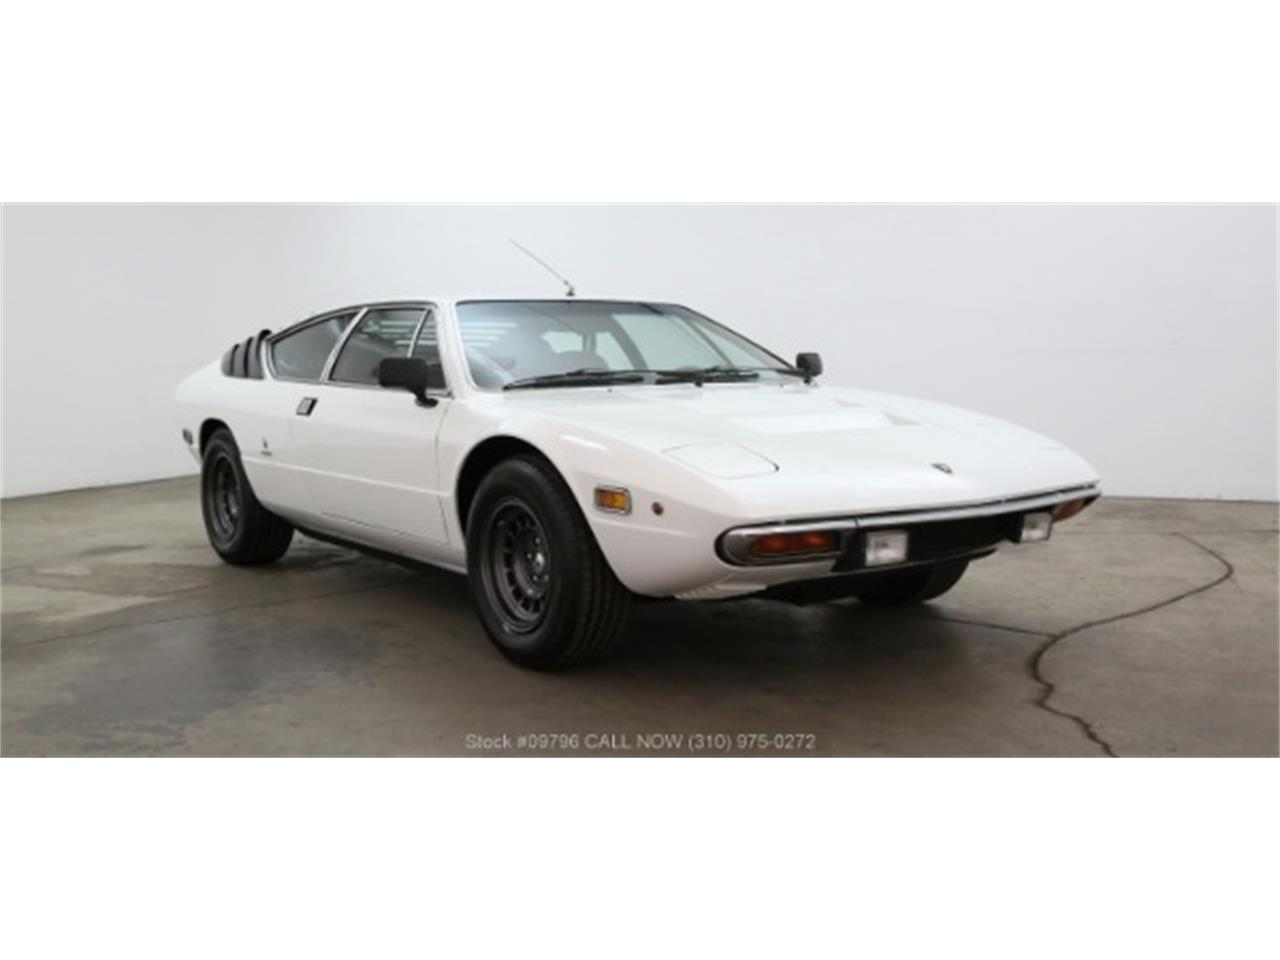 1974 Lamborghini Urraco P250 For Sale Classiccars Com Cc 1111298